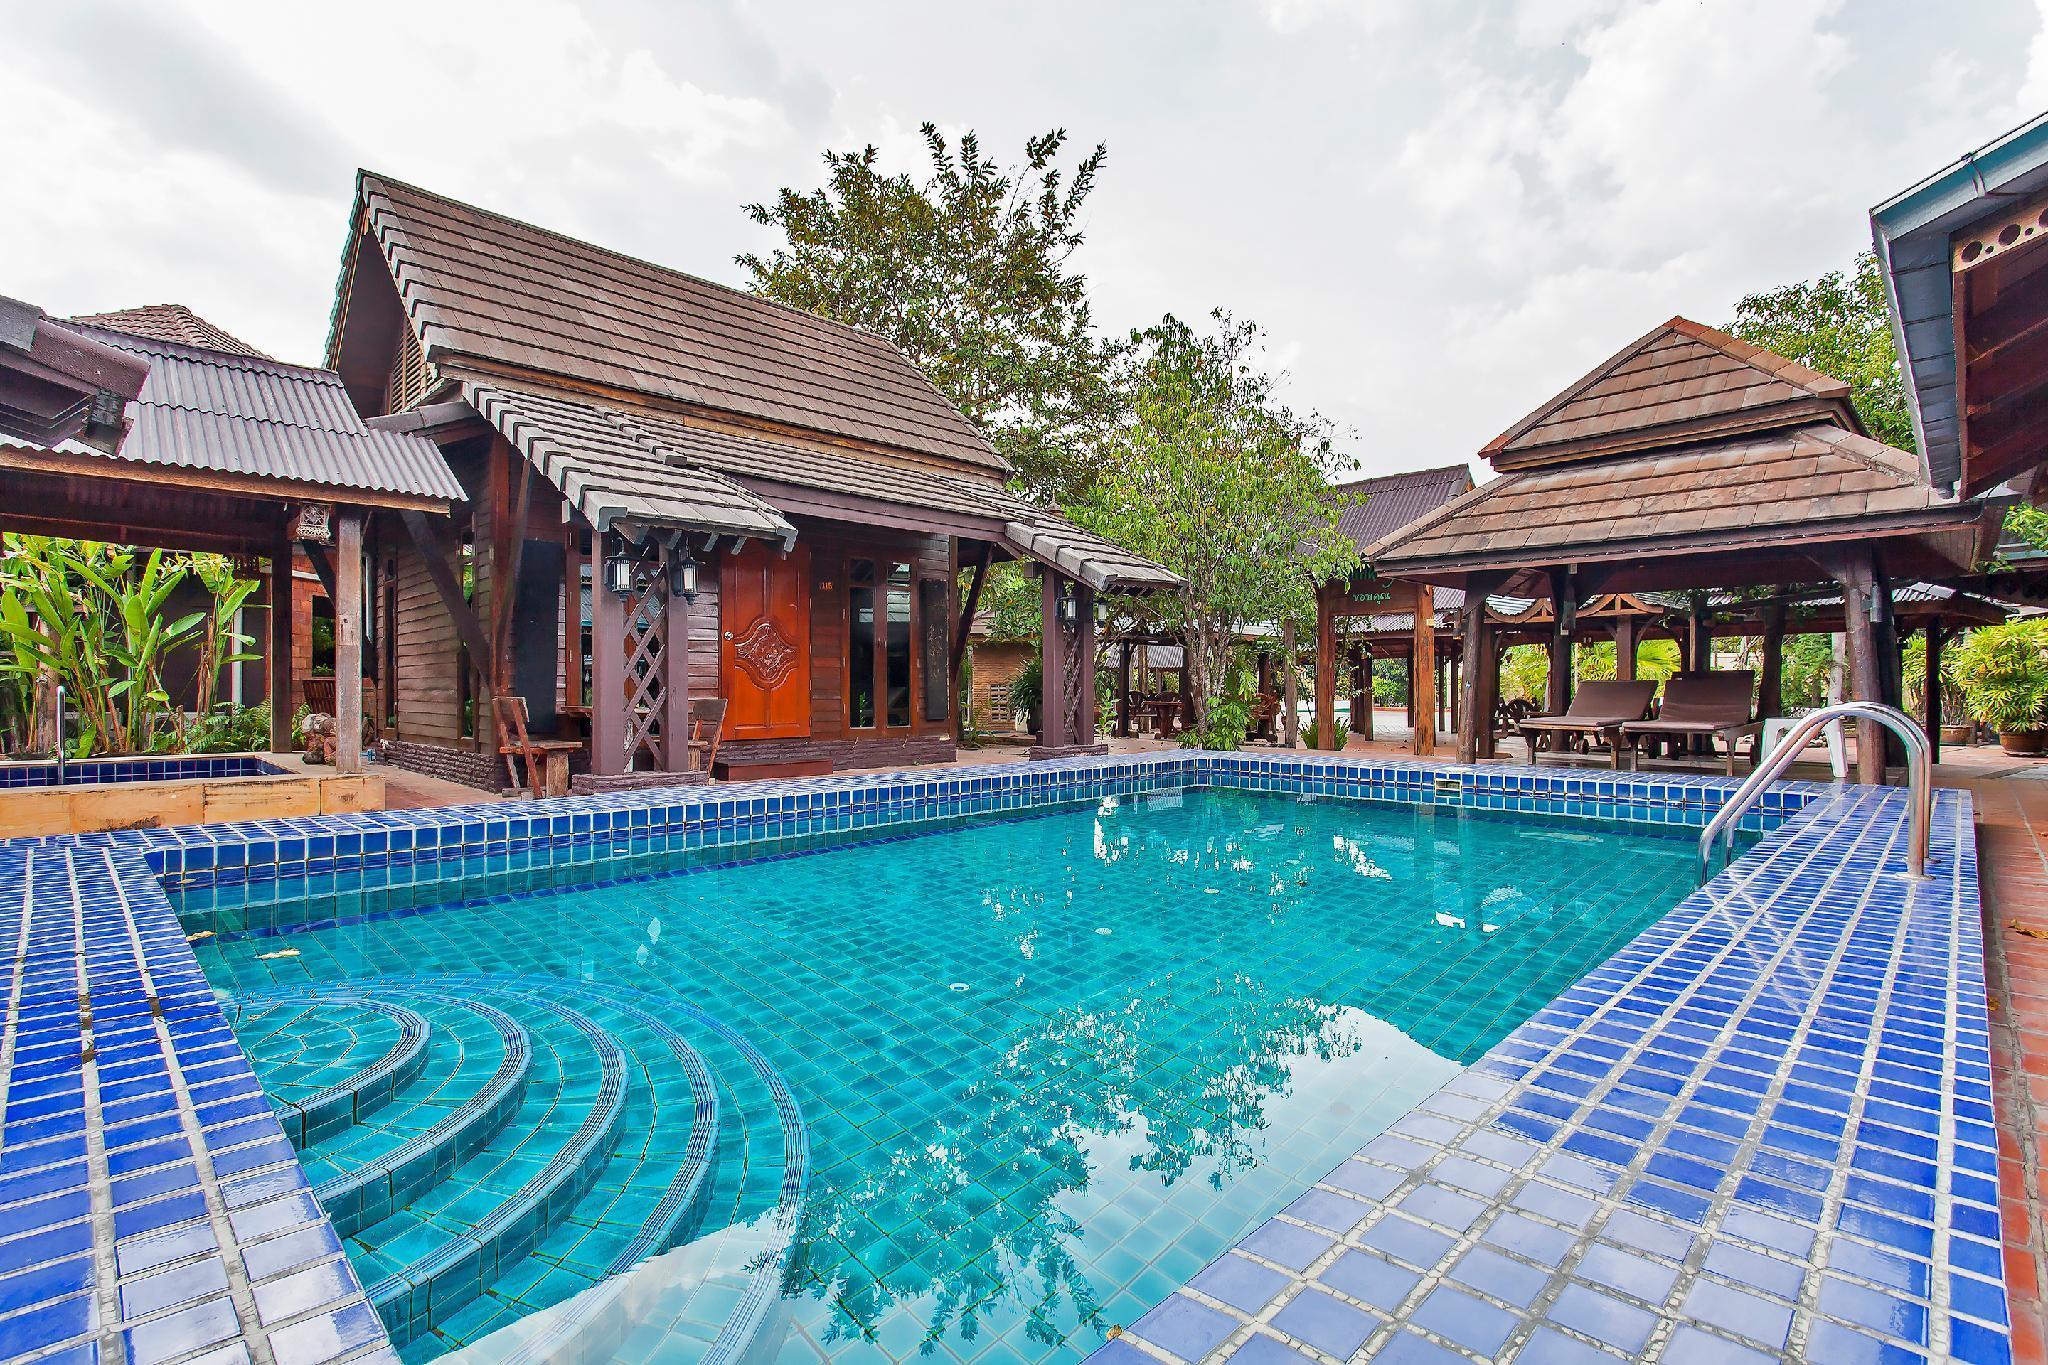 Serenity Gardens Resort 21 Bedroom w Pool and Gym วิลลา 21 ห้องนอน 21 ห้องน้ำส่วนตัว ขนาด 1900 ตร.ม. – มาบประชันเรเซอเวอร์